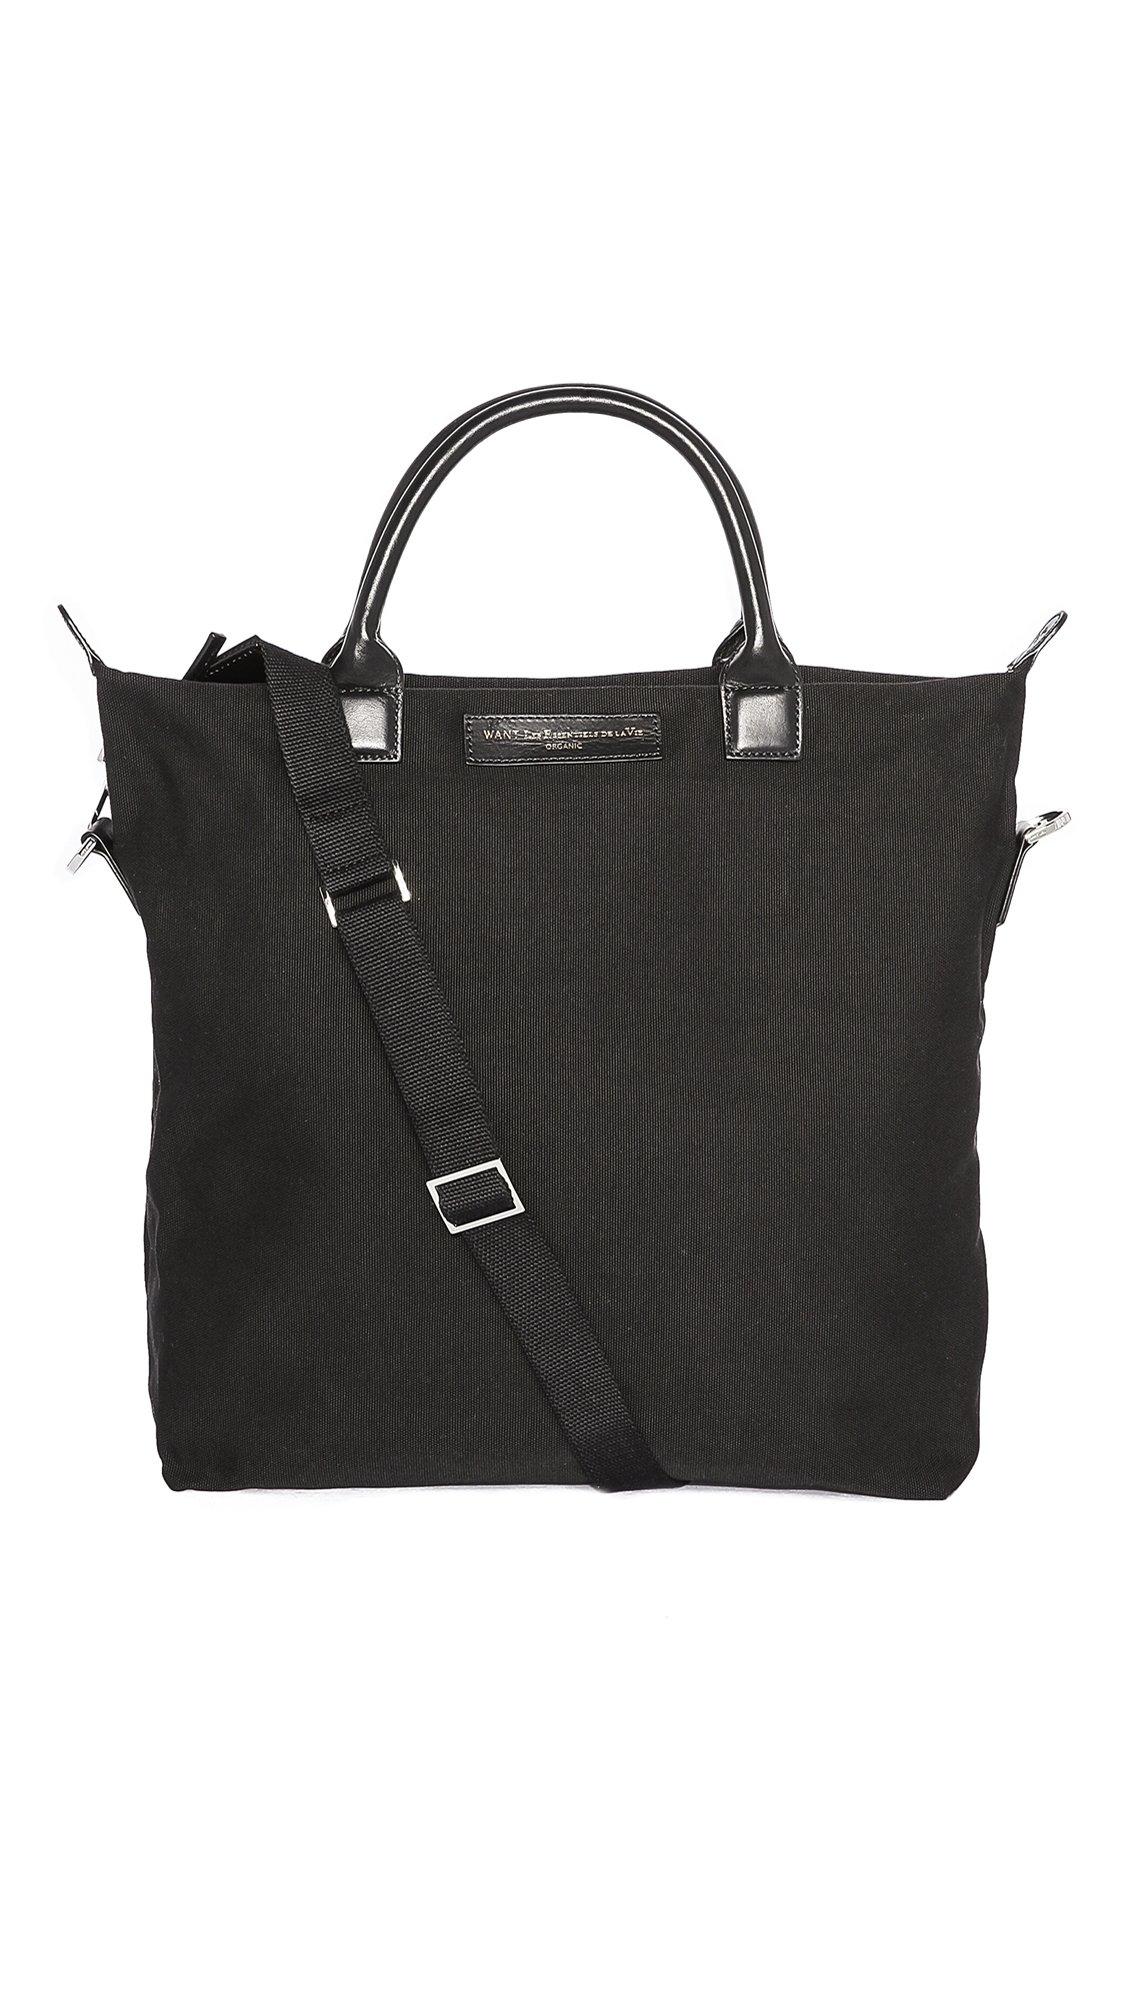 WANT Les Essentiels Men's O'Hare Canvas Shopper Tote, Black/Black, One Size